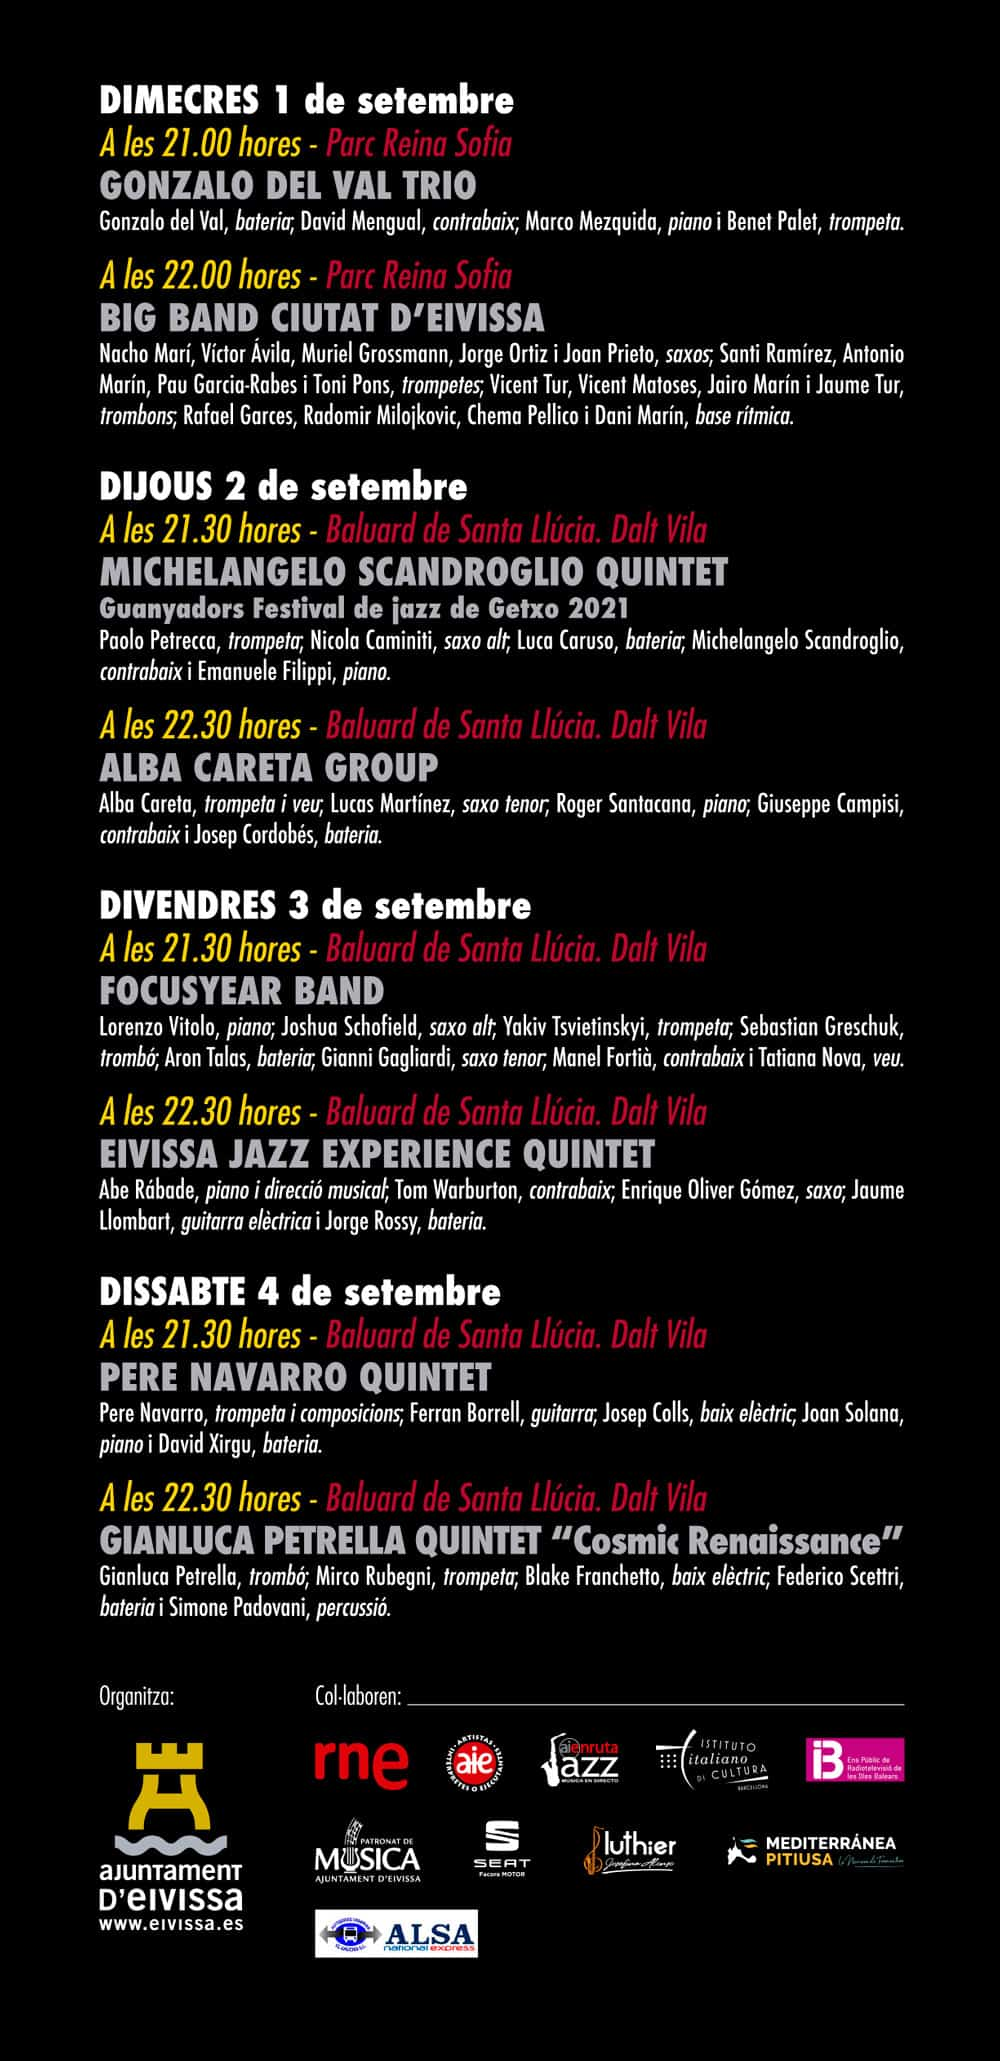 programma-festival-eivissa-jazz-ibiza-2021-welcometoibiza